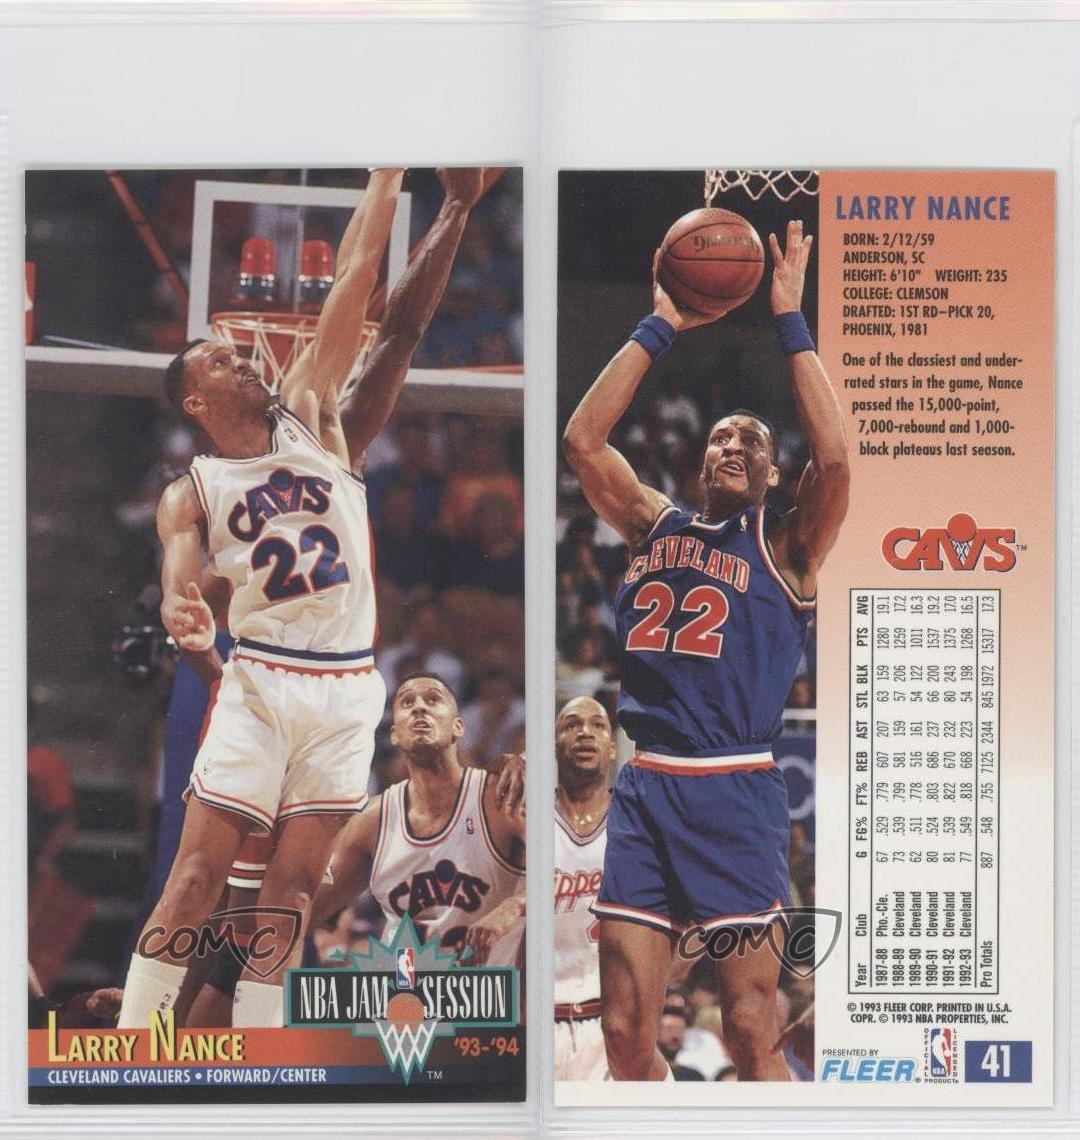 1993-94 NBA Jam Session #41 Larry Nance Cleveland